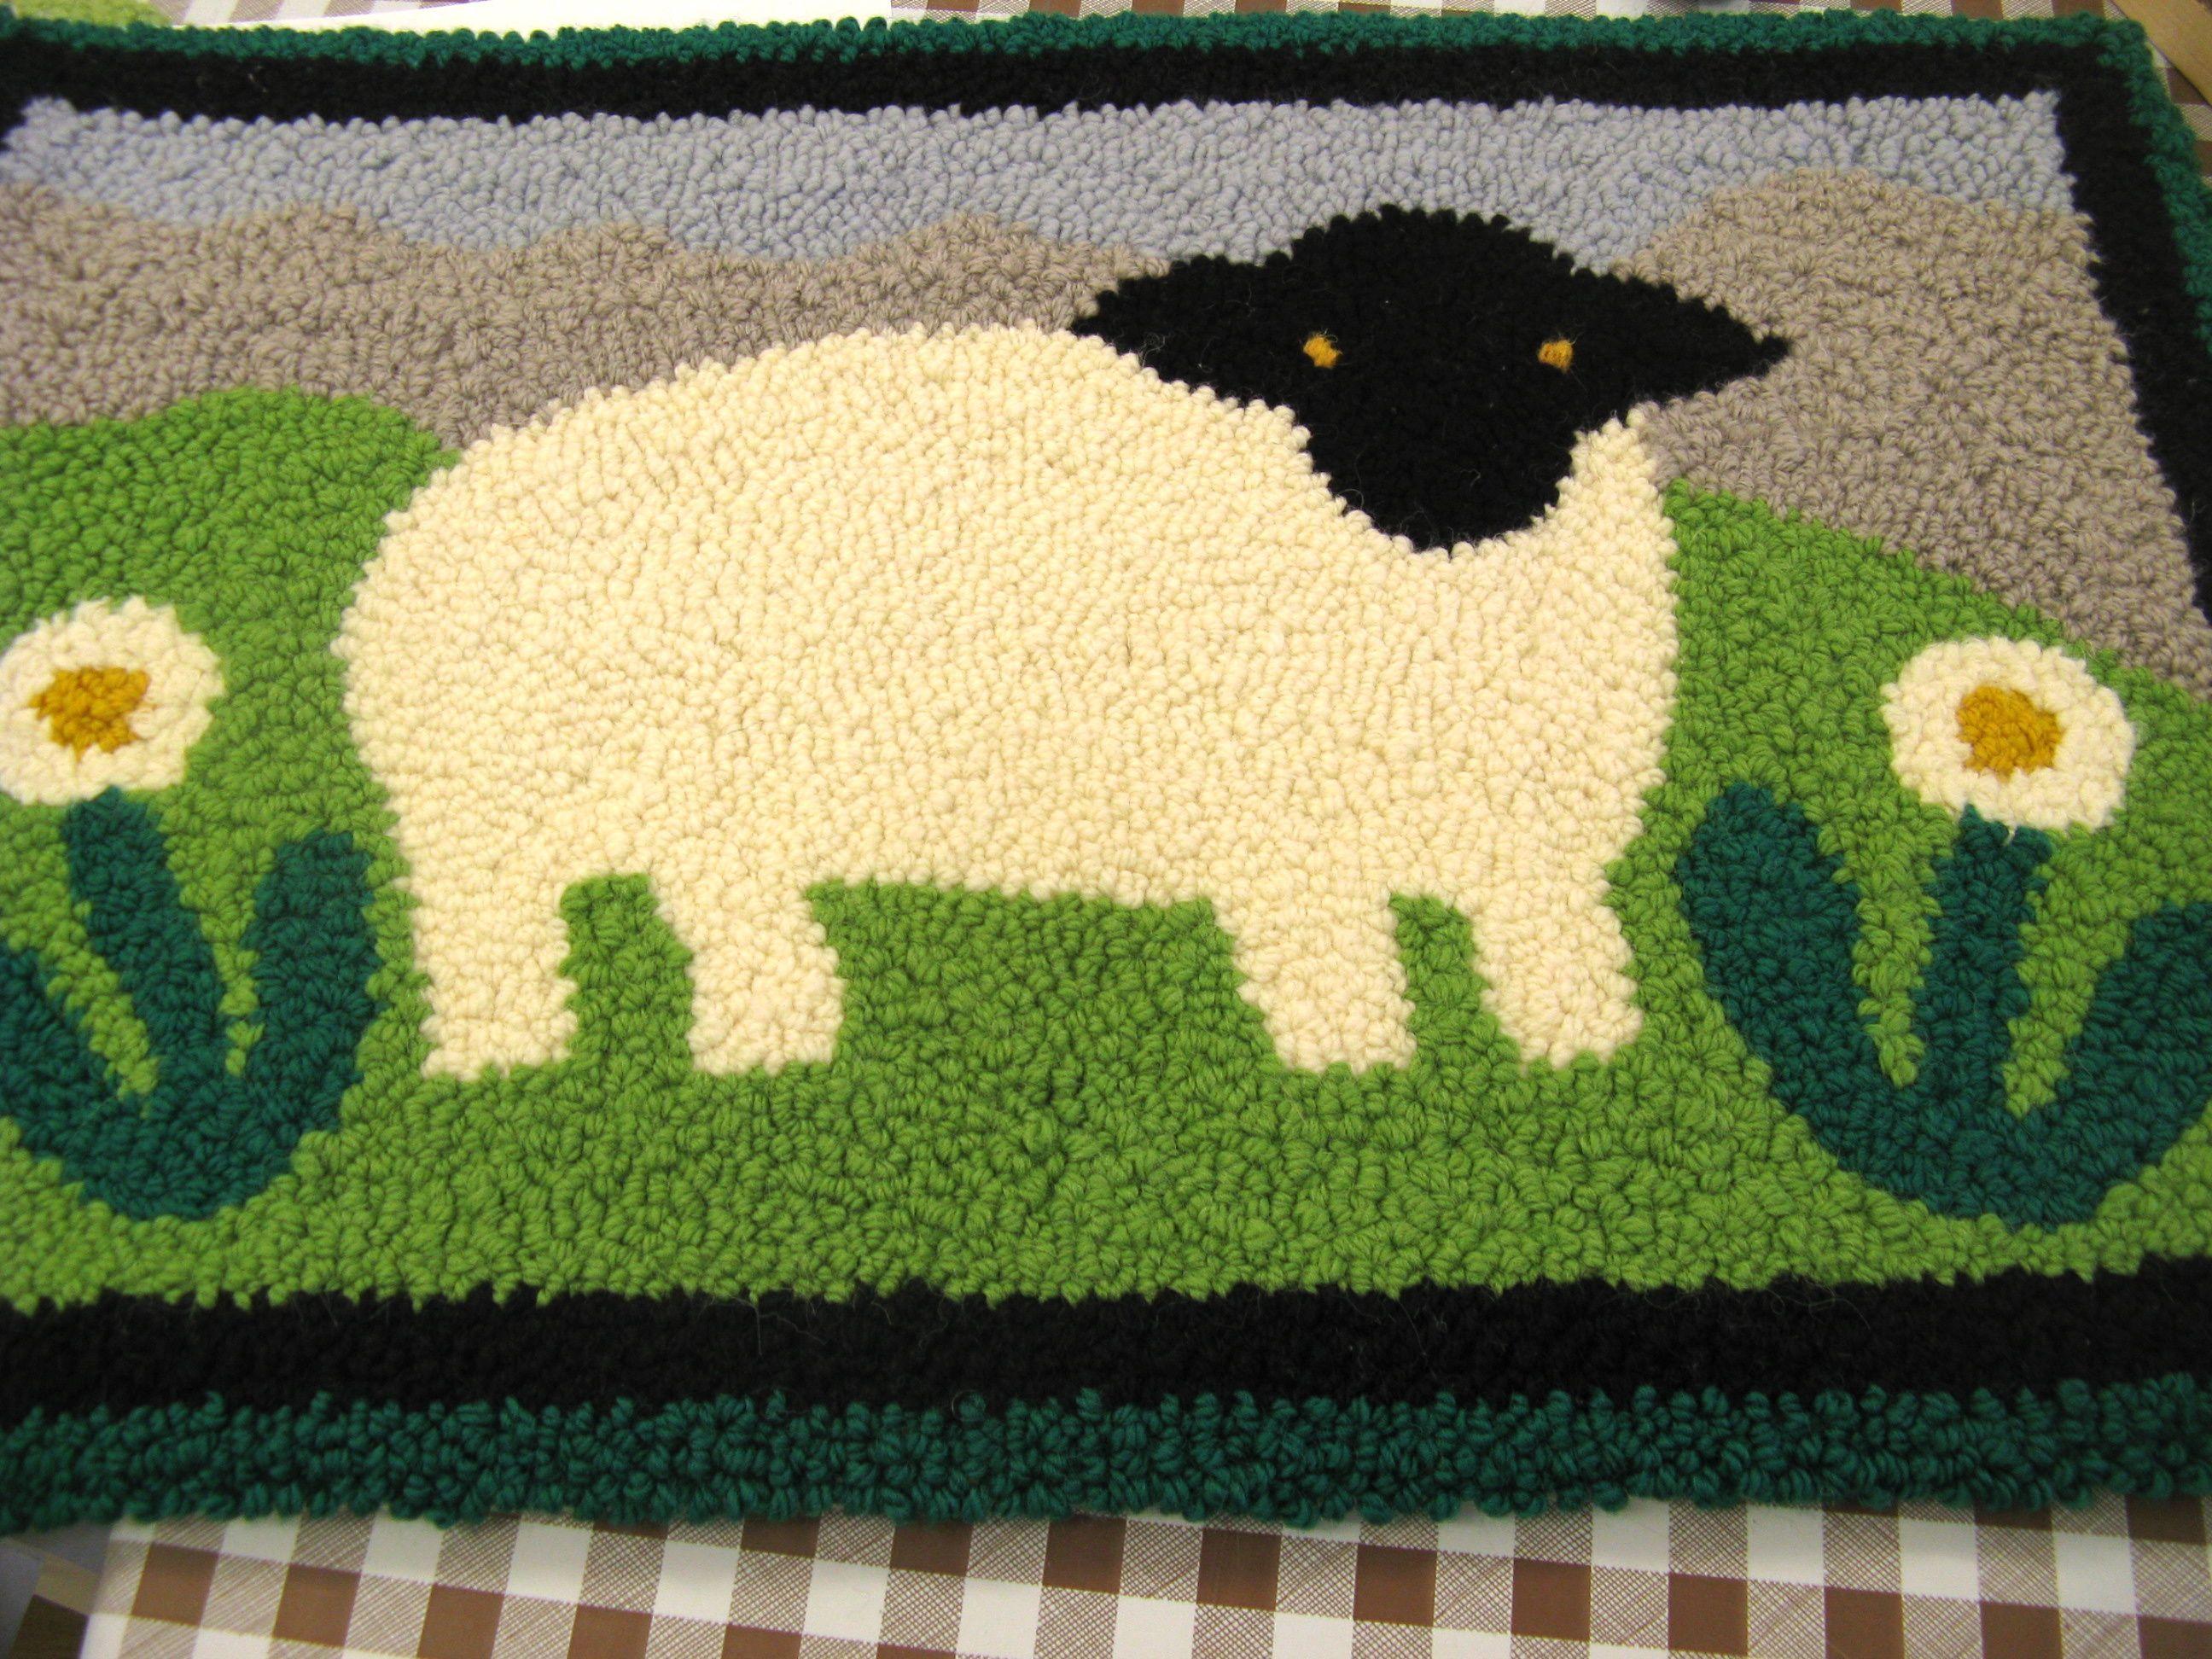 Sonia's sheep design rug